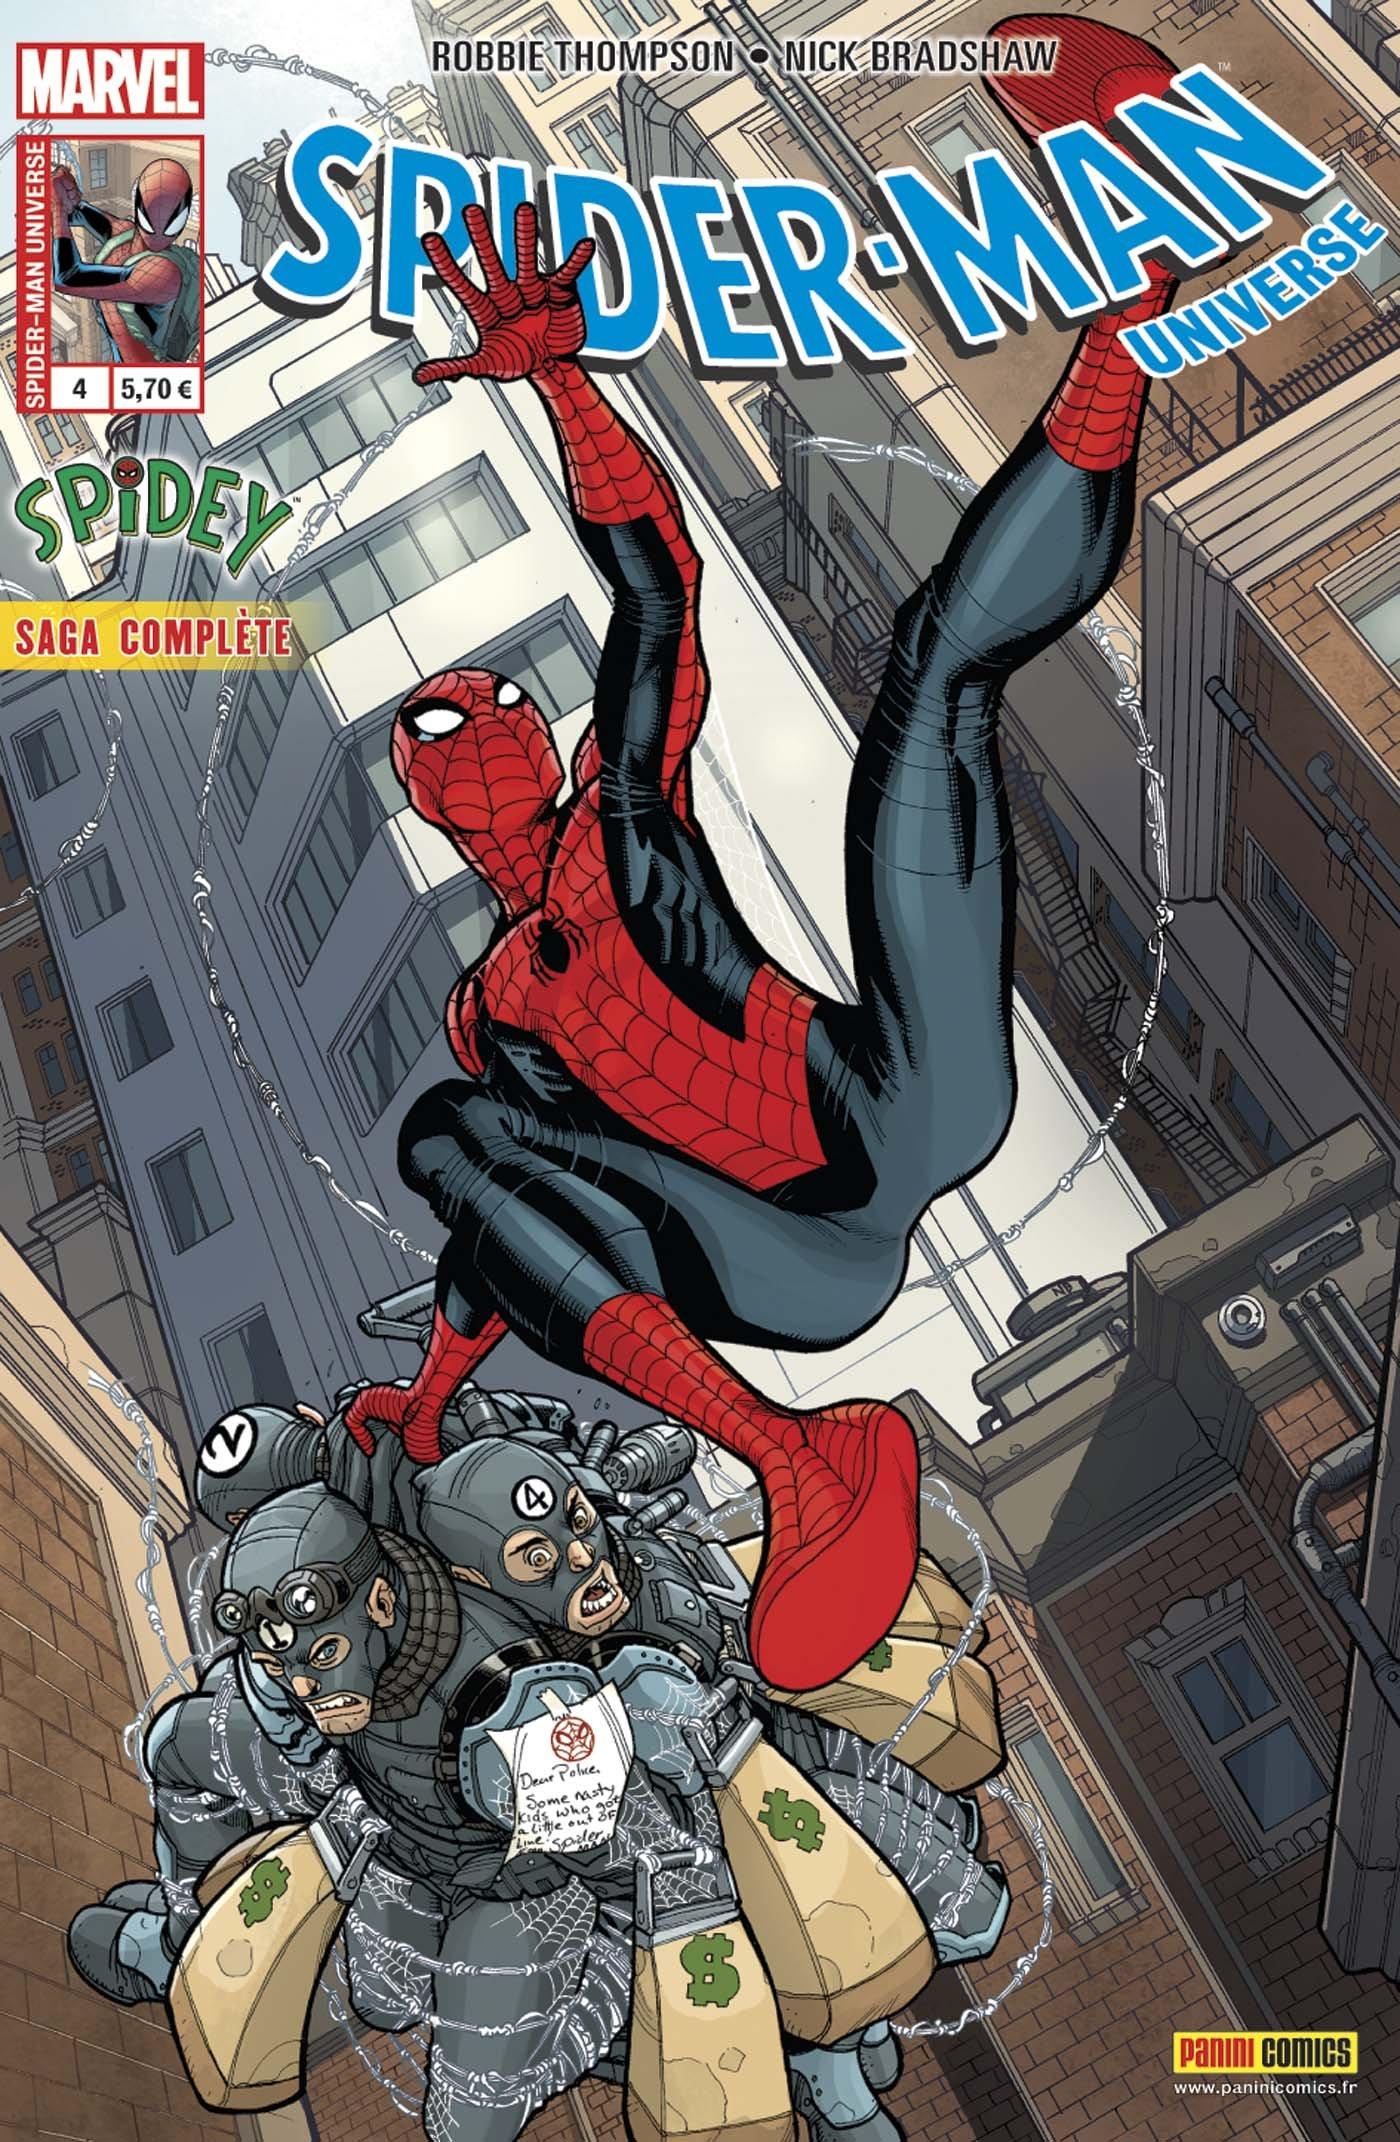 img_comics_10585_spider-man-universe-4-spidey